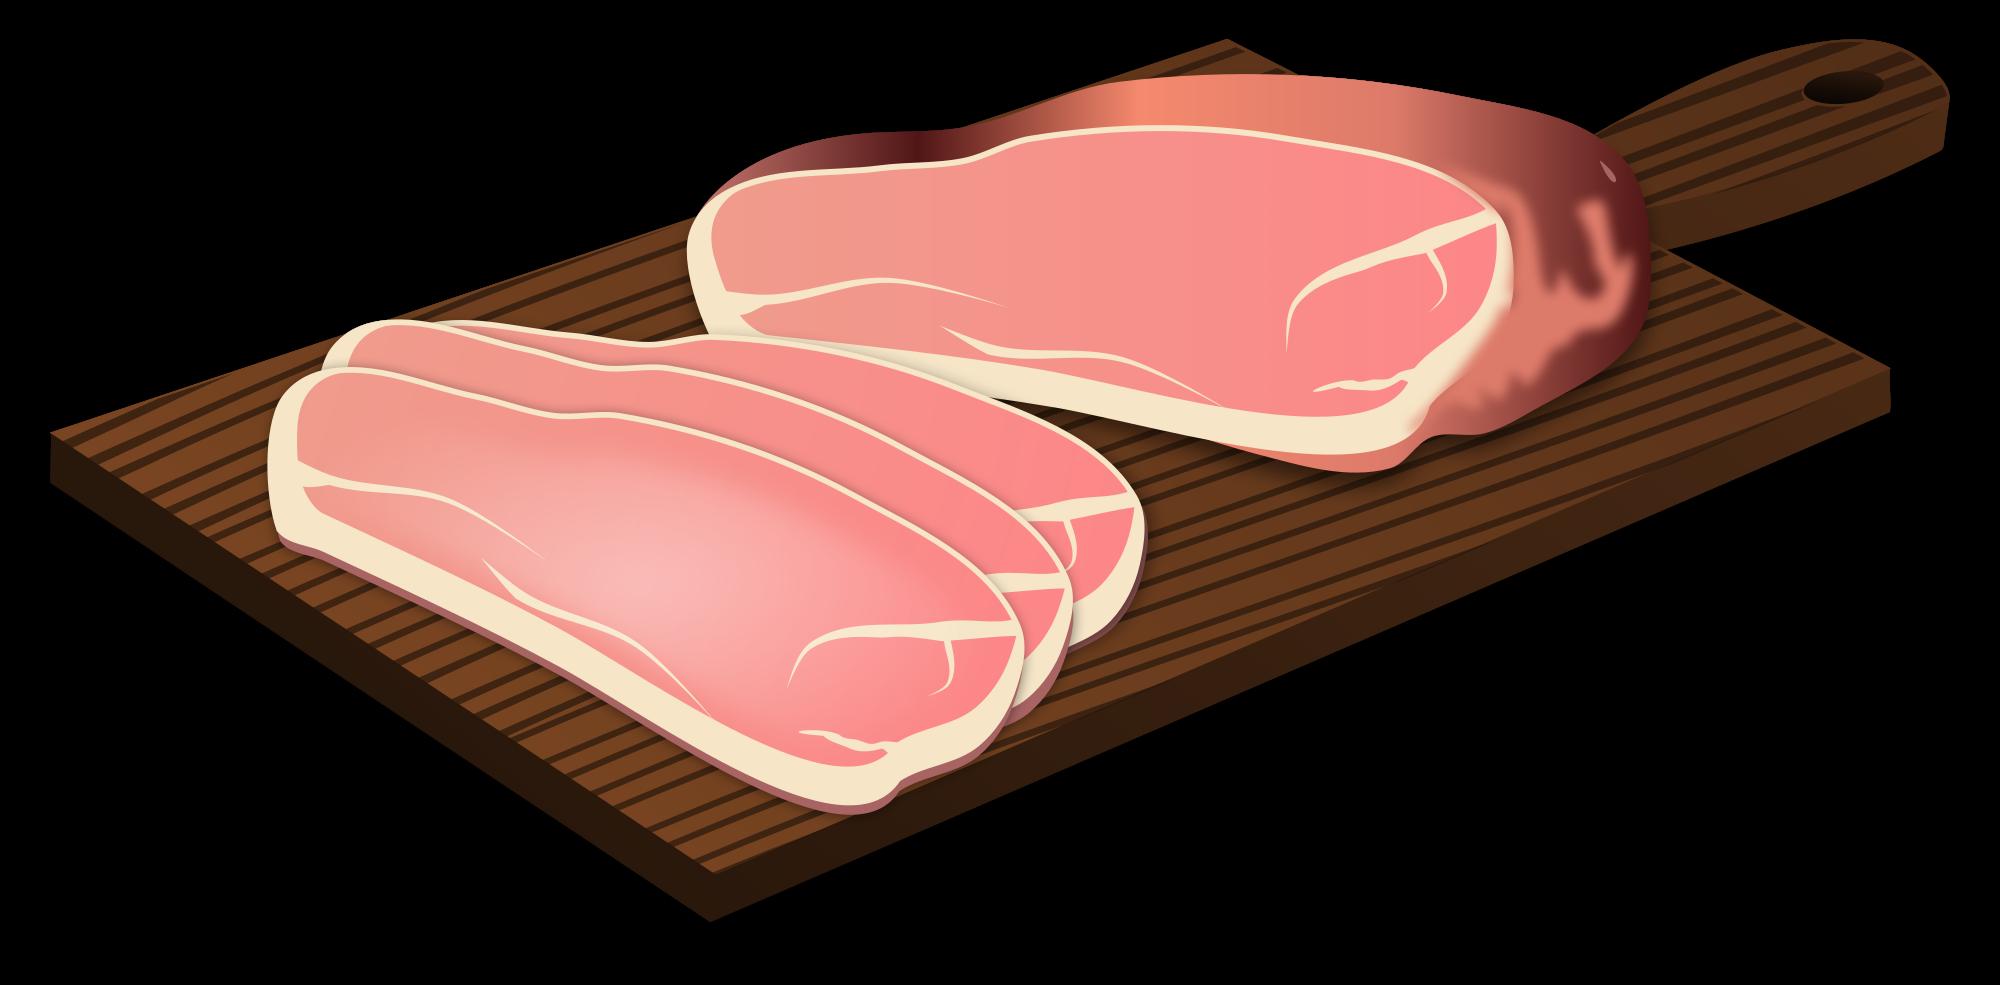 Ham clipart svg. File wikimedia commons open